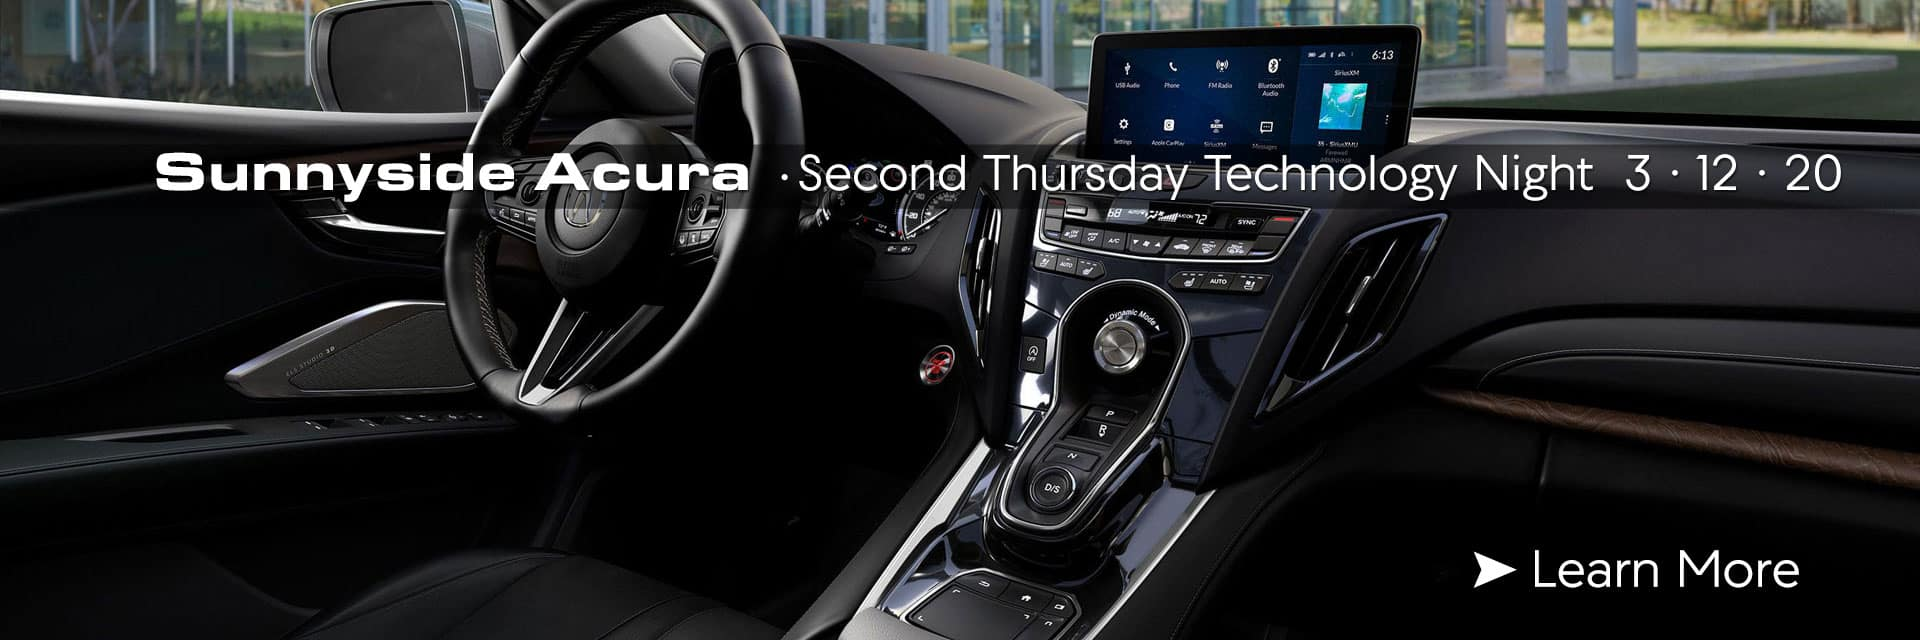 Sunnyside Acura Technology Night March 12 Nashua NH